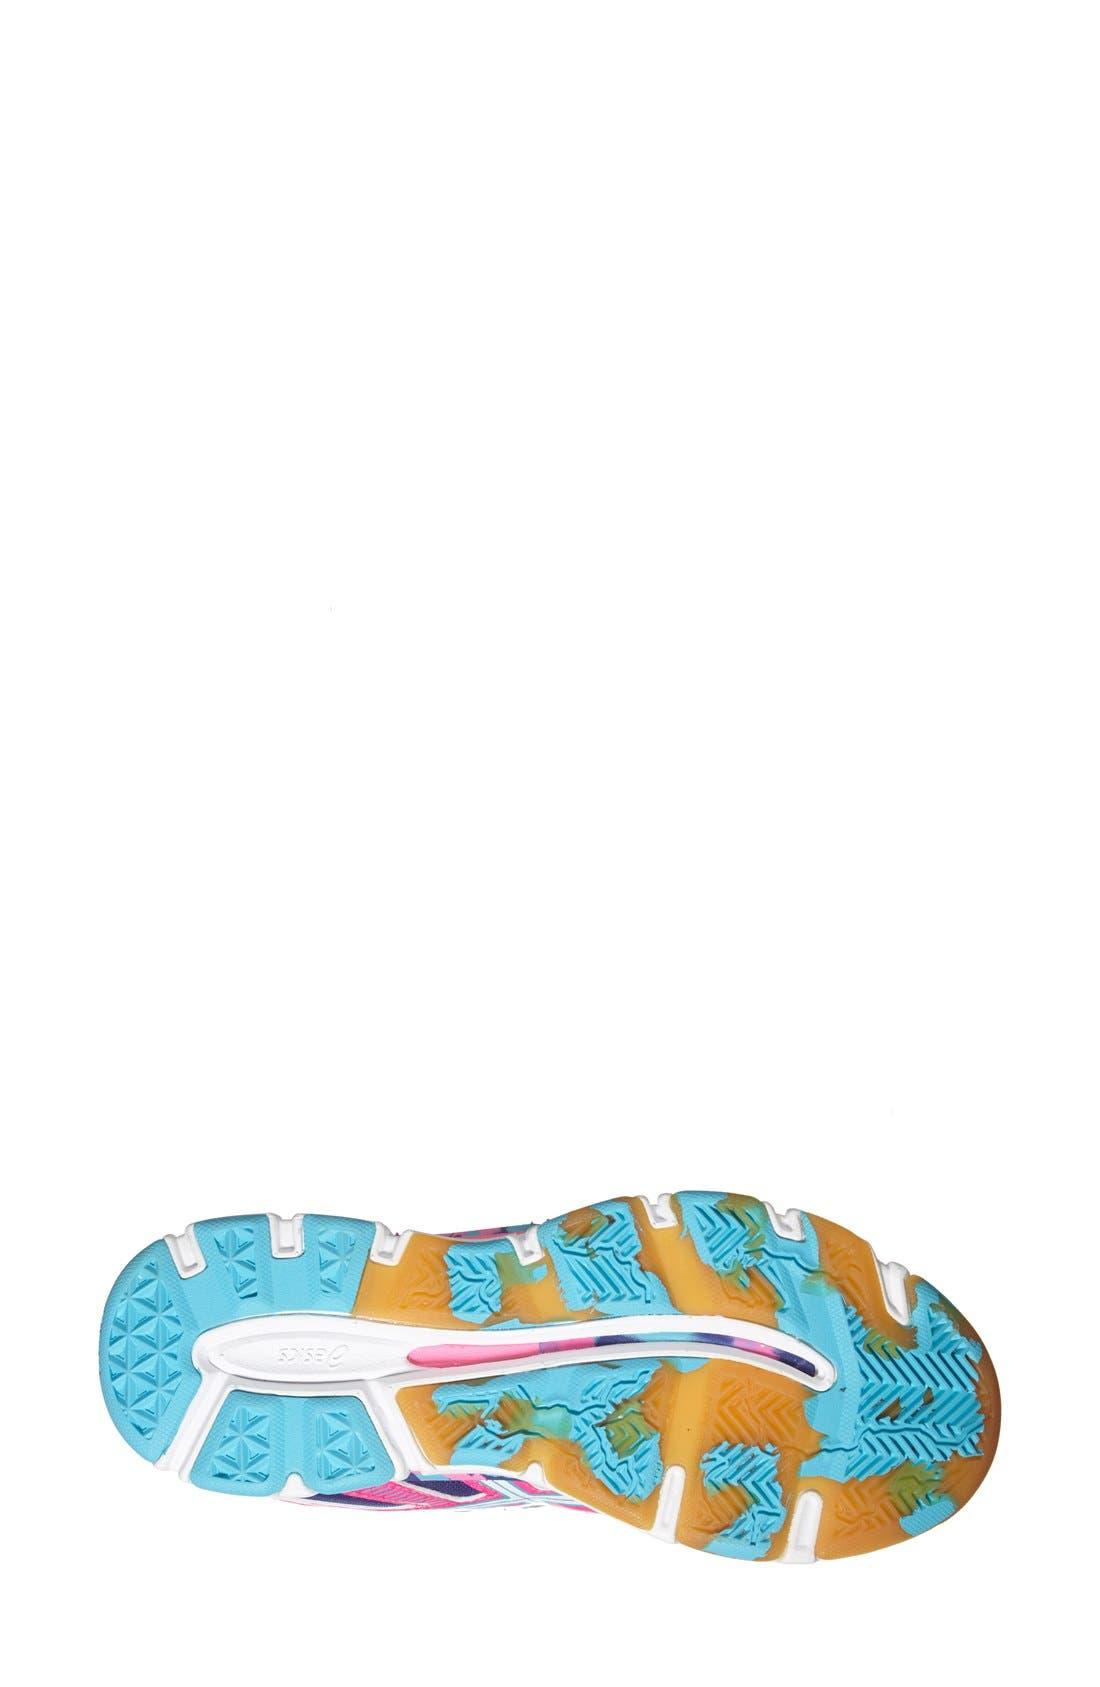 Alternate Image 4  - ASICS® 'GEL-Volleycross® Revolution' Volleyball Shoe (Women) (Regular Retail Price: 109.95)